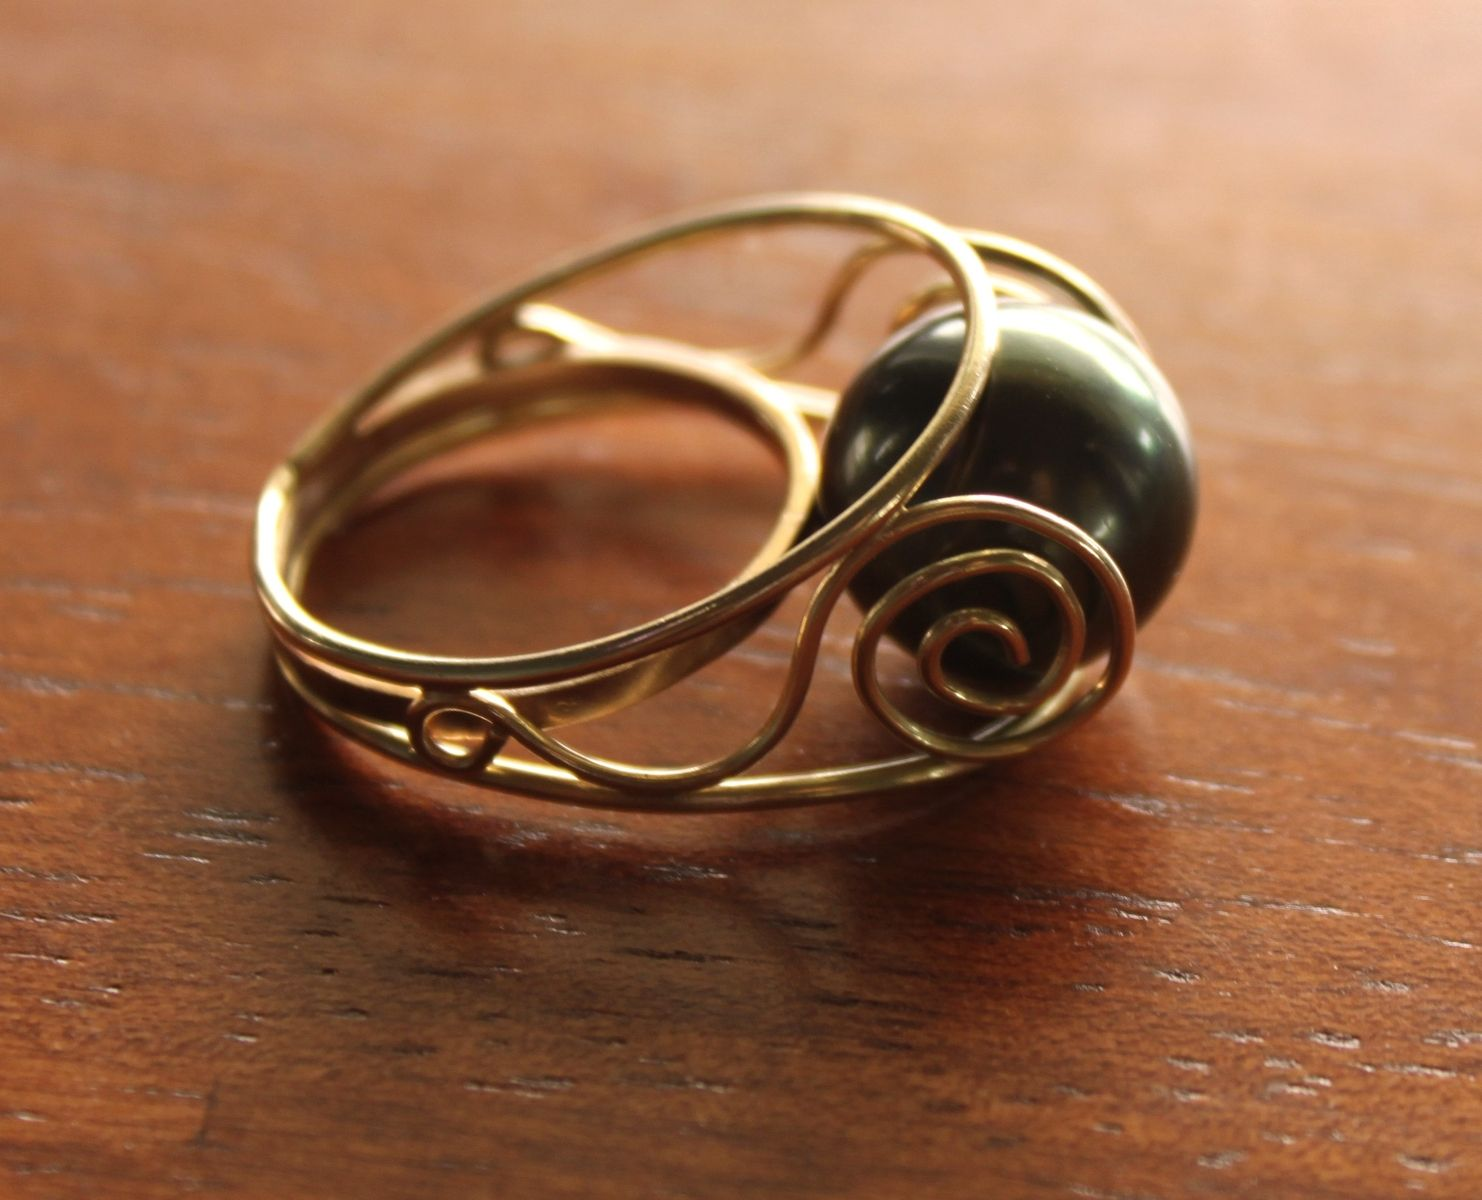 handmade tahitian pearl ring by mg designs. Black Bedroom Furniture Sets. Home Design Ideas